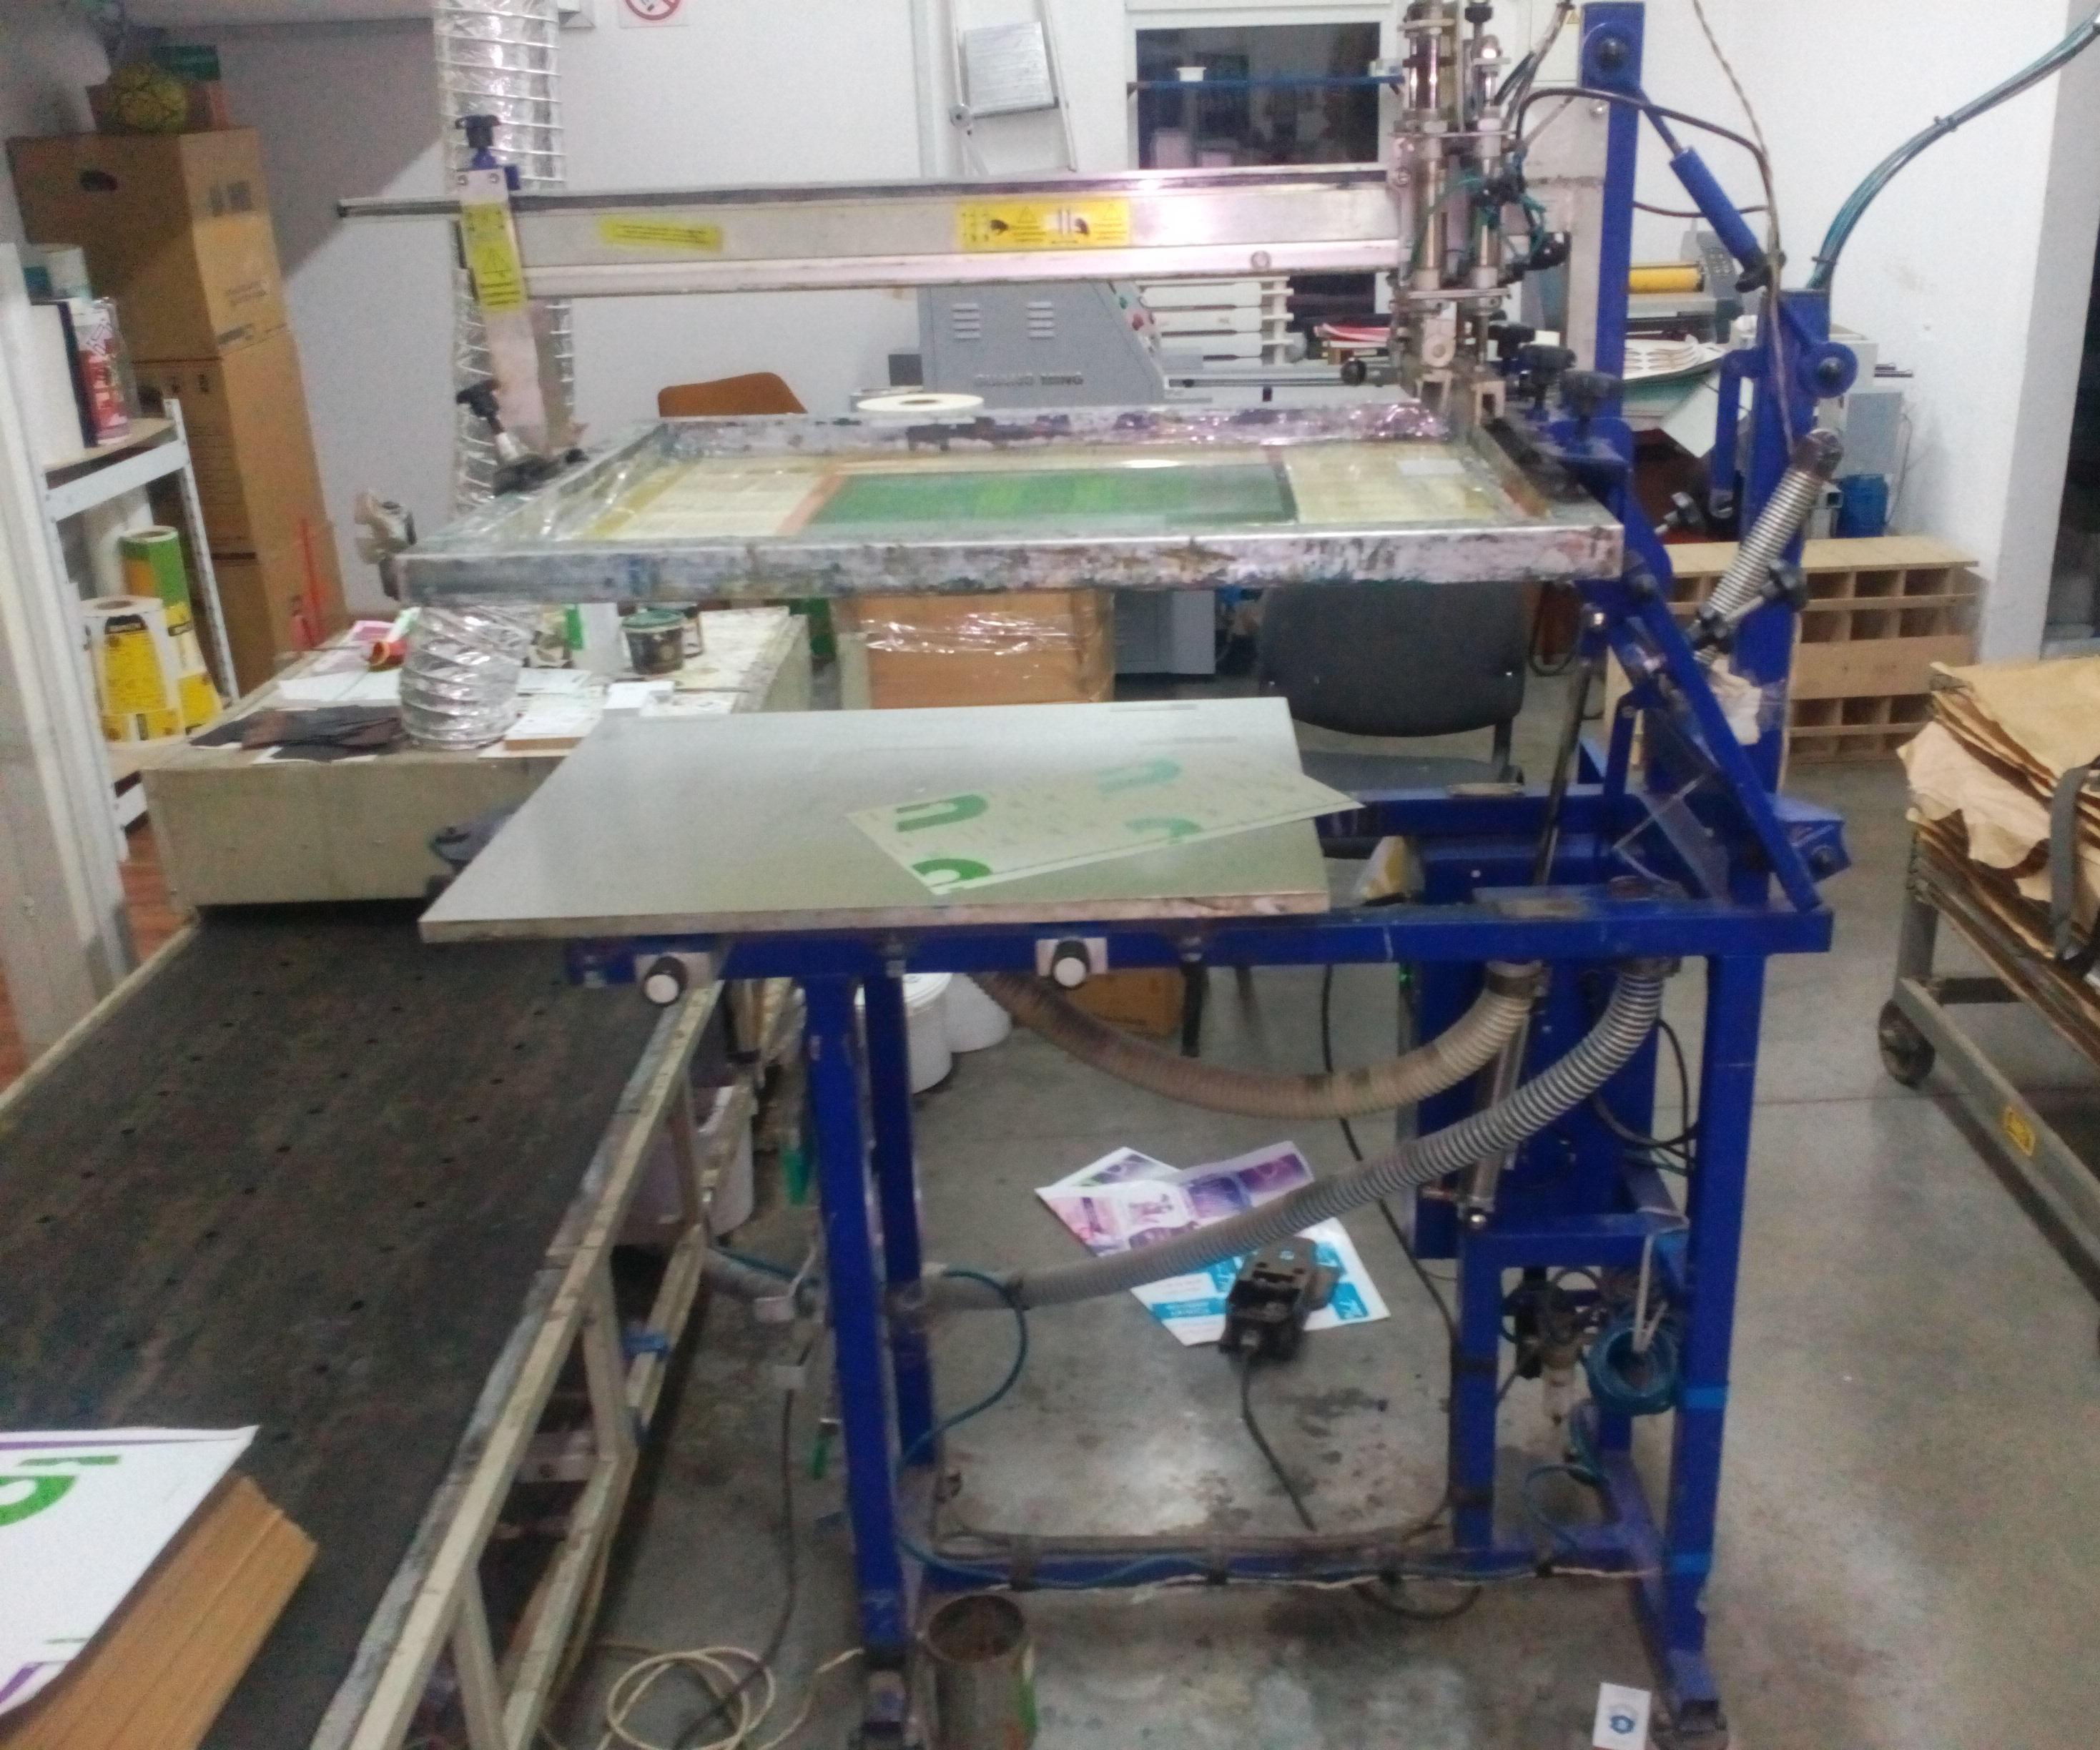 Repairing SCHULZE HA5070 printing press Using Arduino + Original docs +Arduino scetch